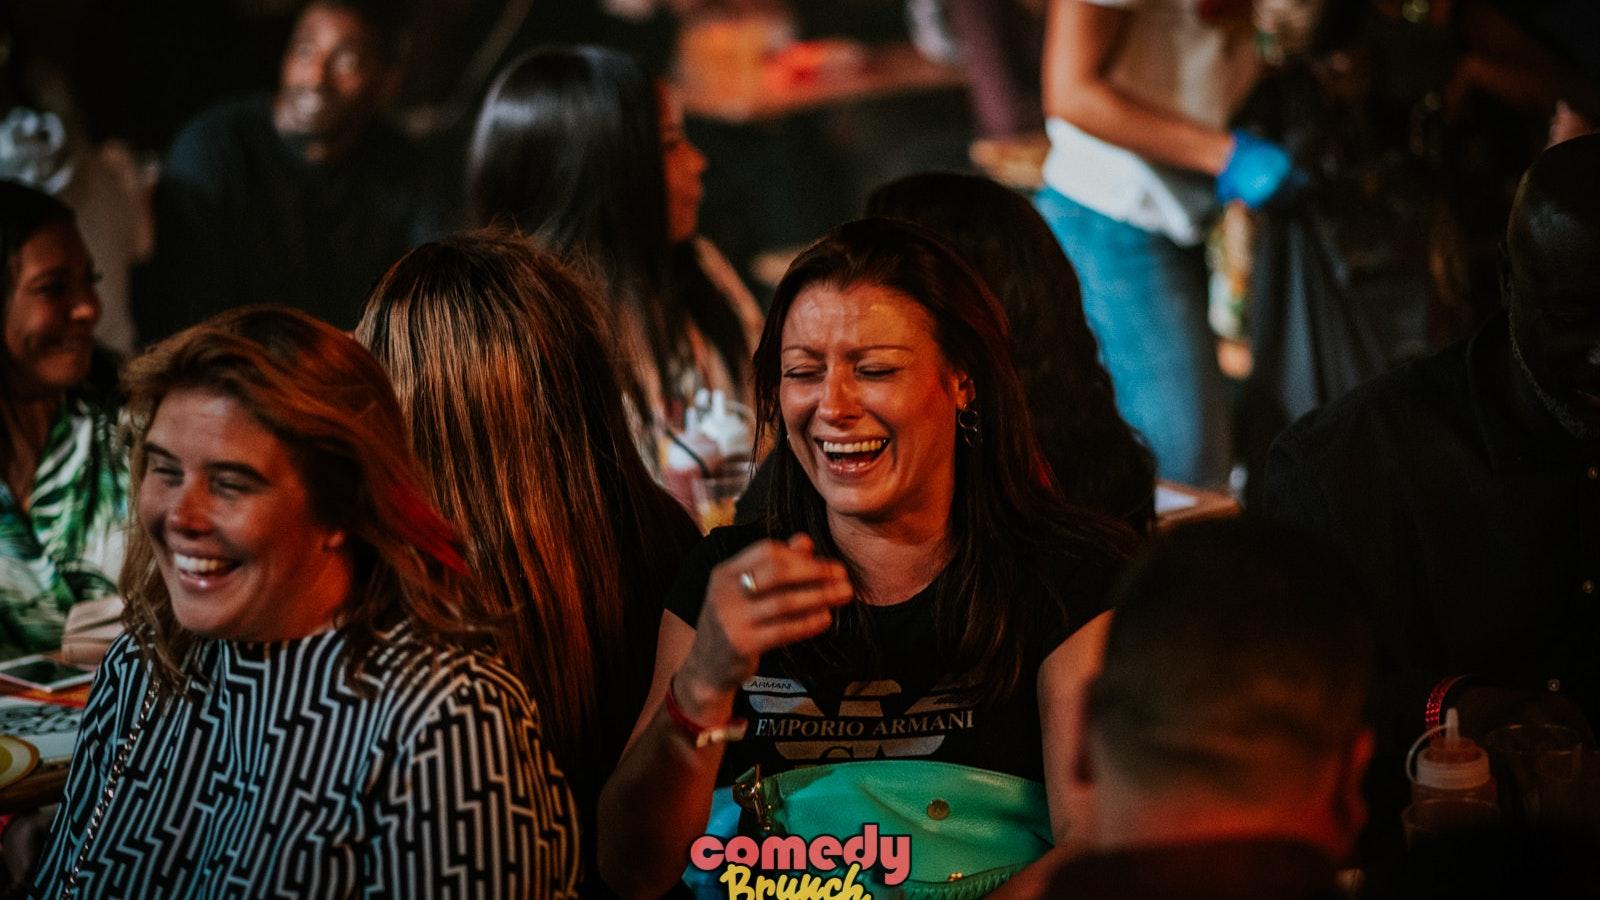 Comedy Brunch – 25th April